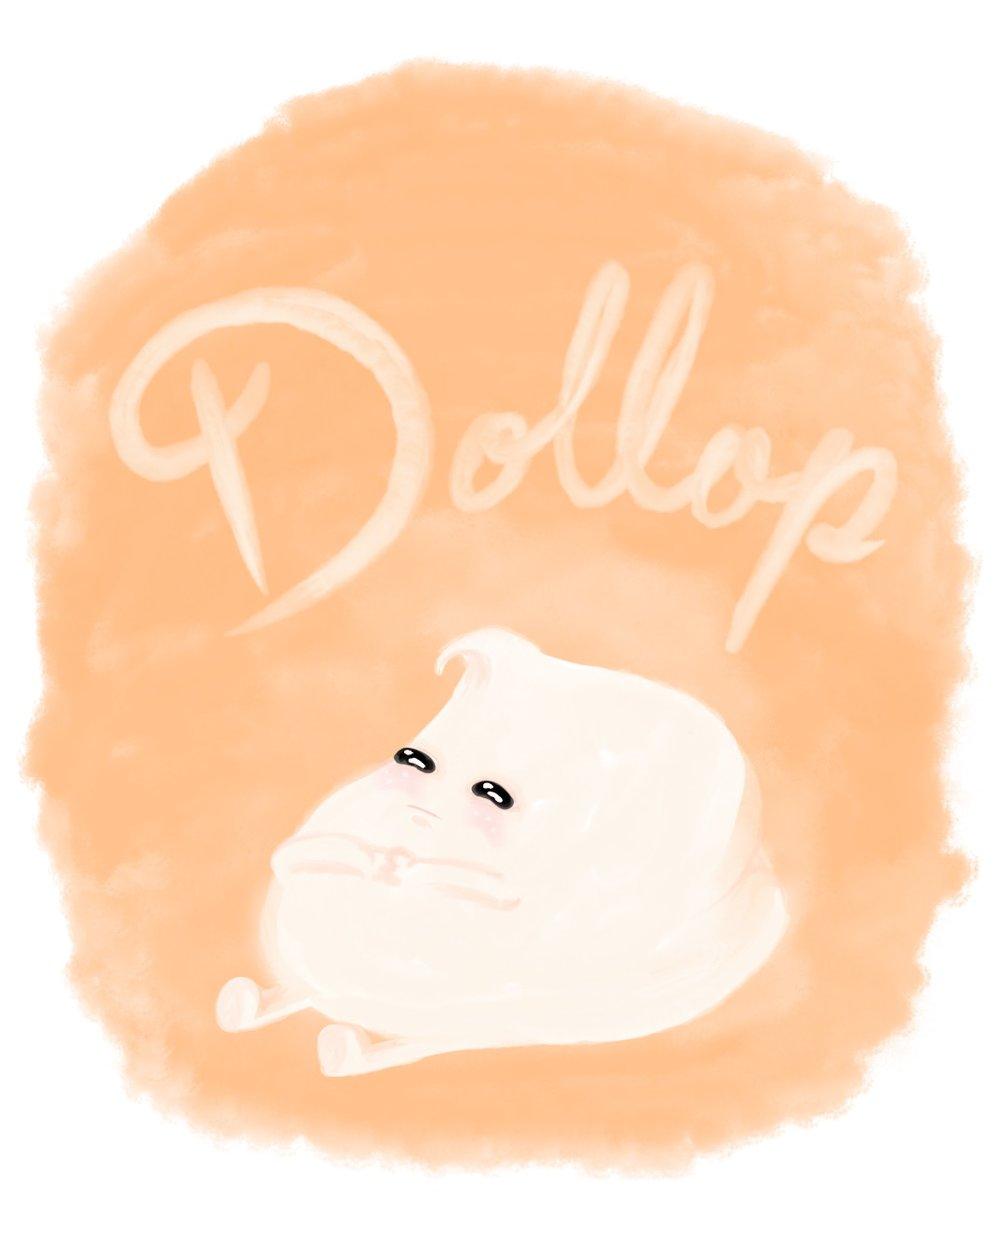 dollop1.jpg